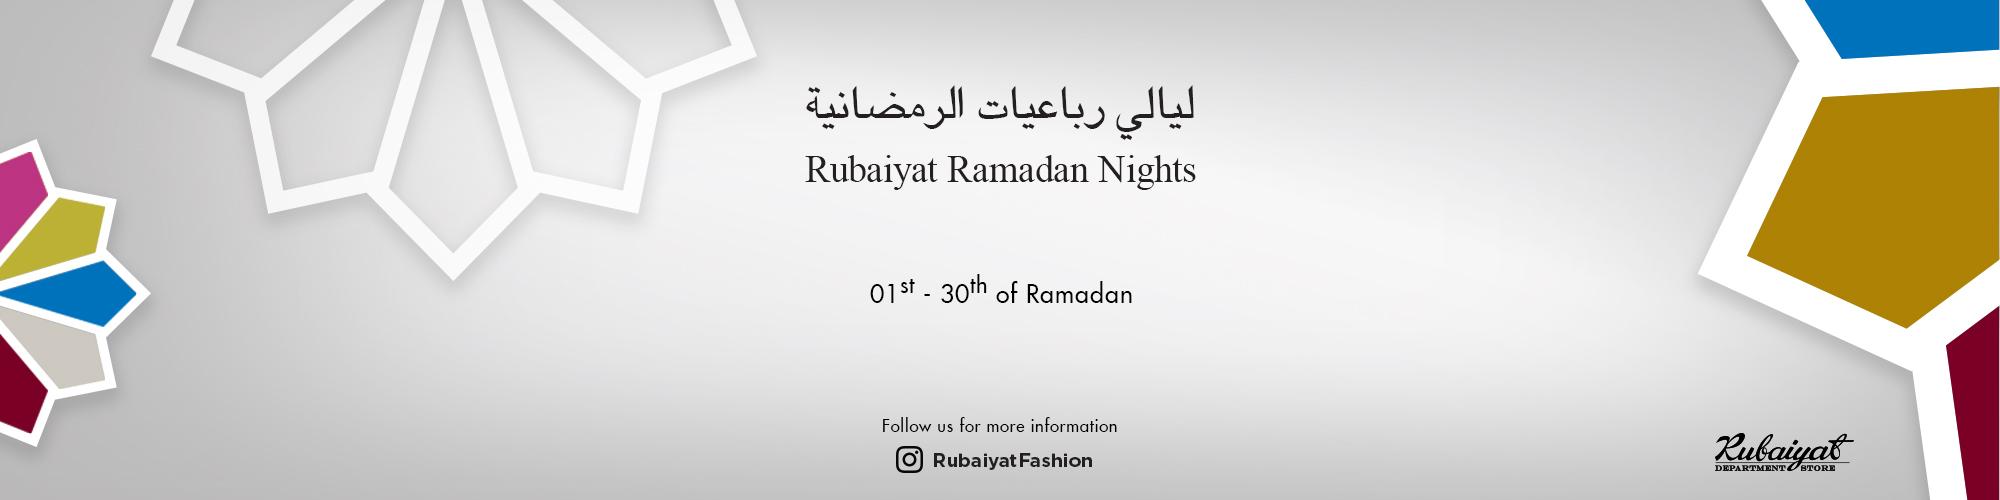 Ramadan-2016-web-banner-02